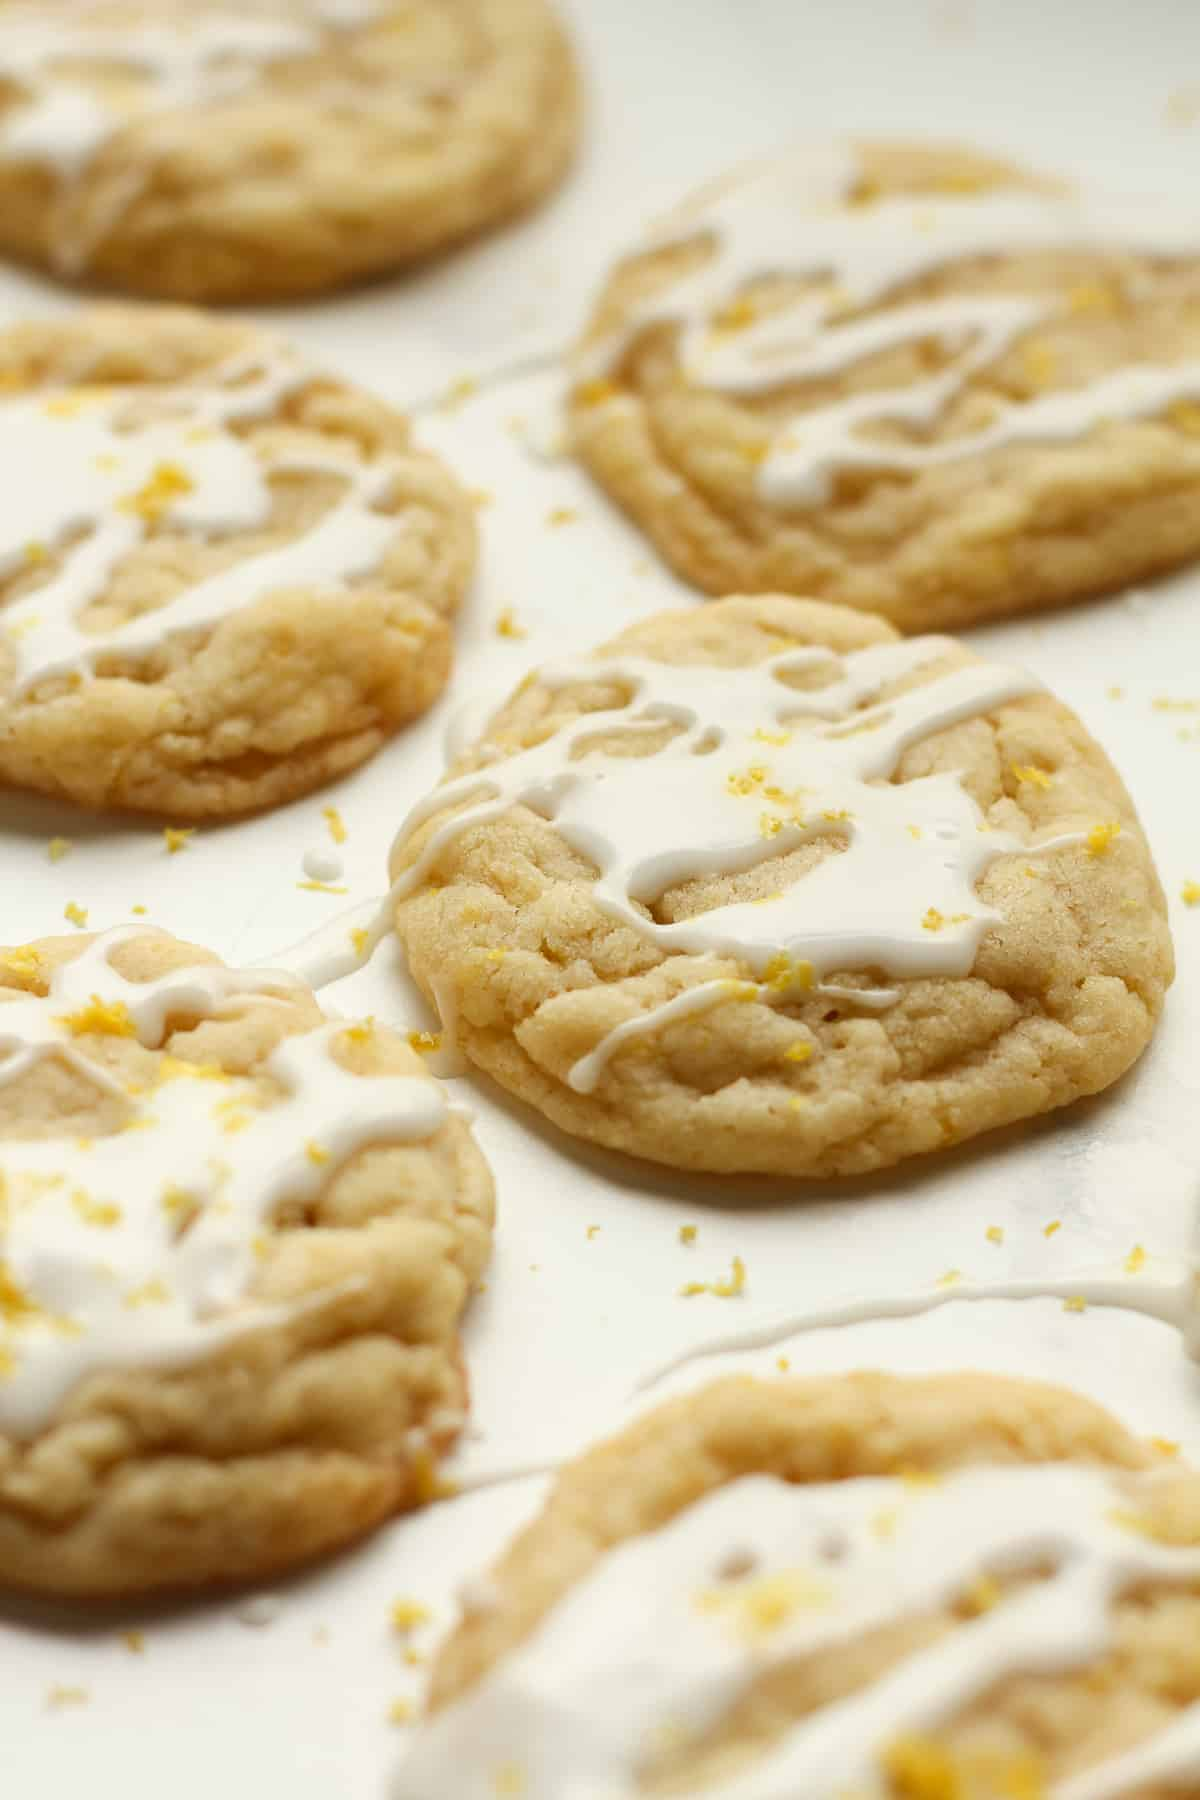 Side shot of lemon sugar cookies, glazed.